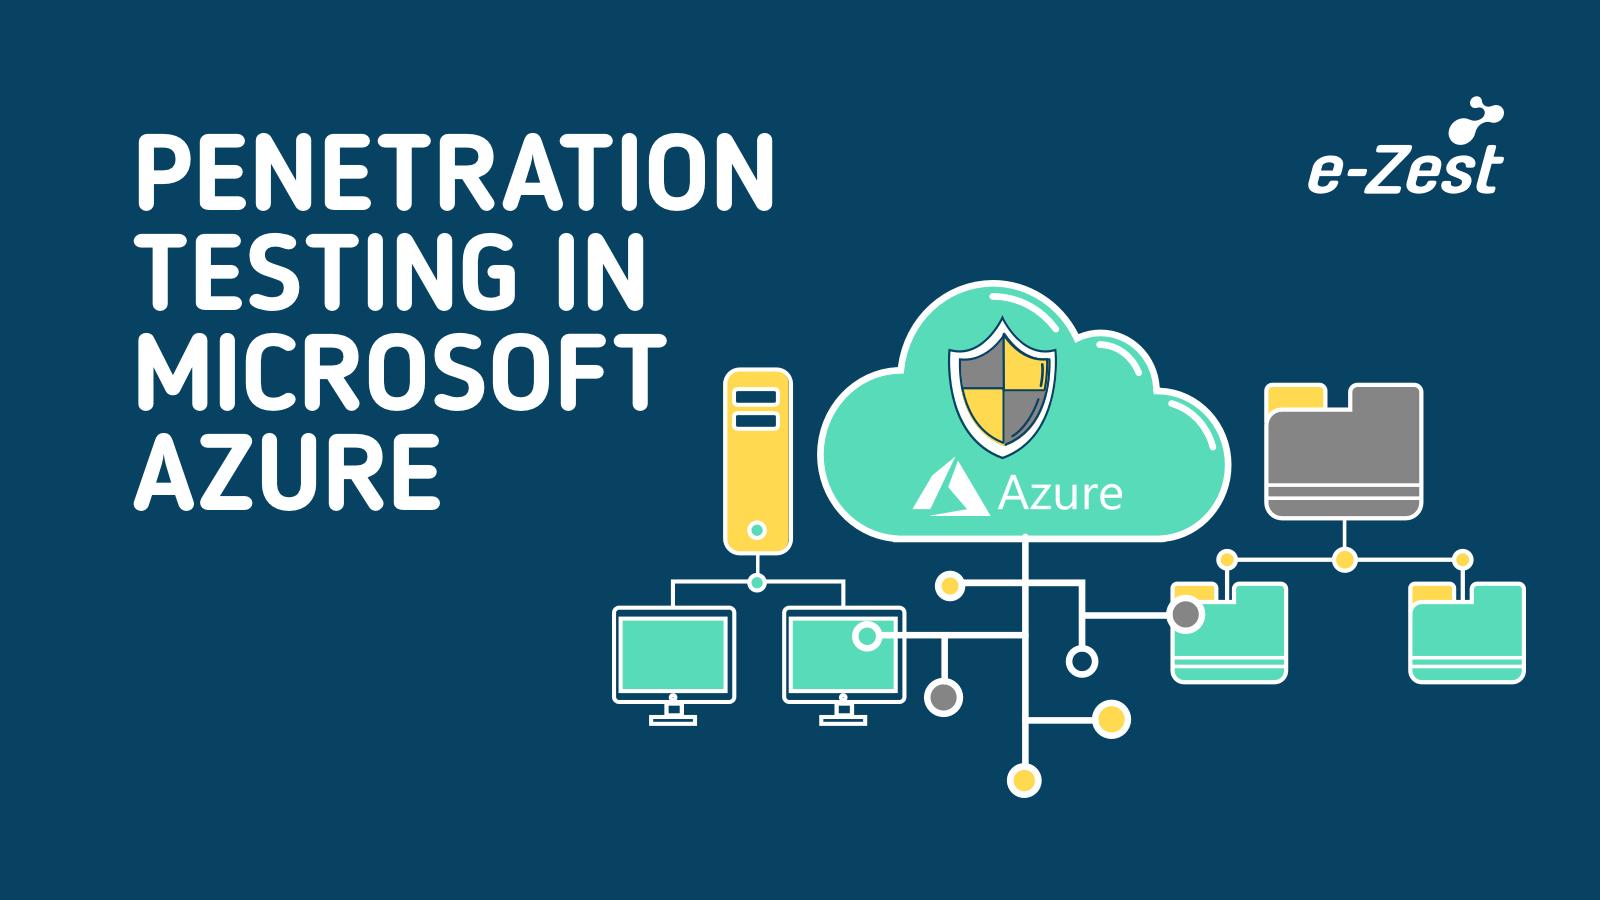 Penetration Testing in Microsoft Azure